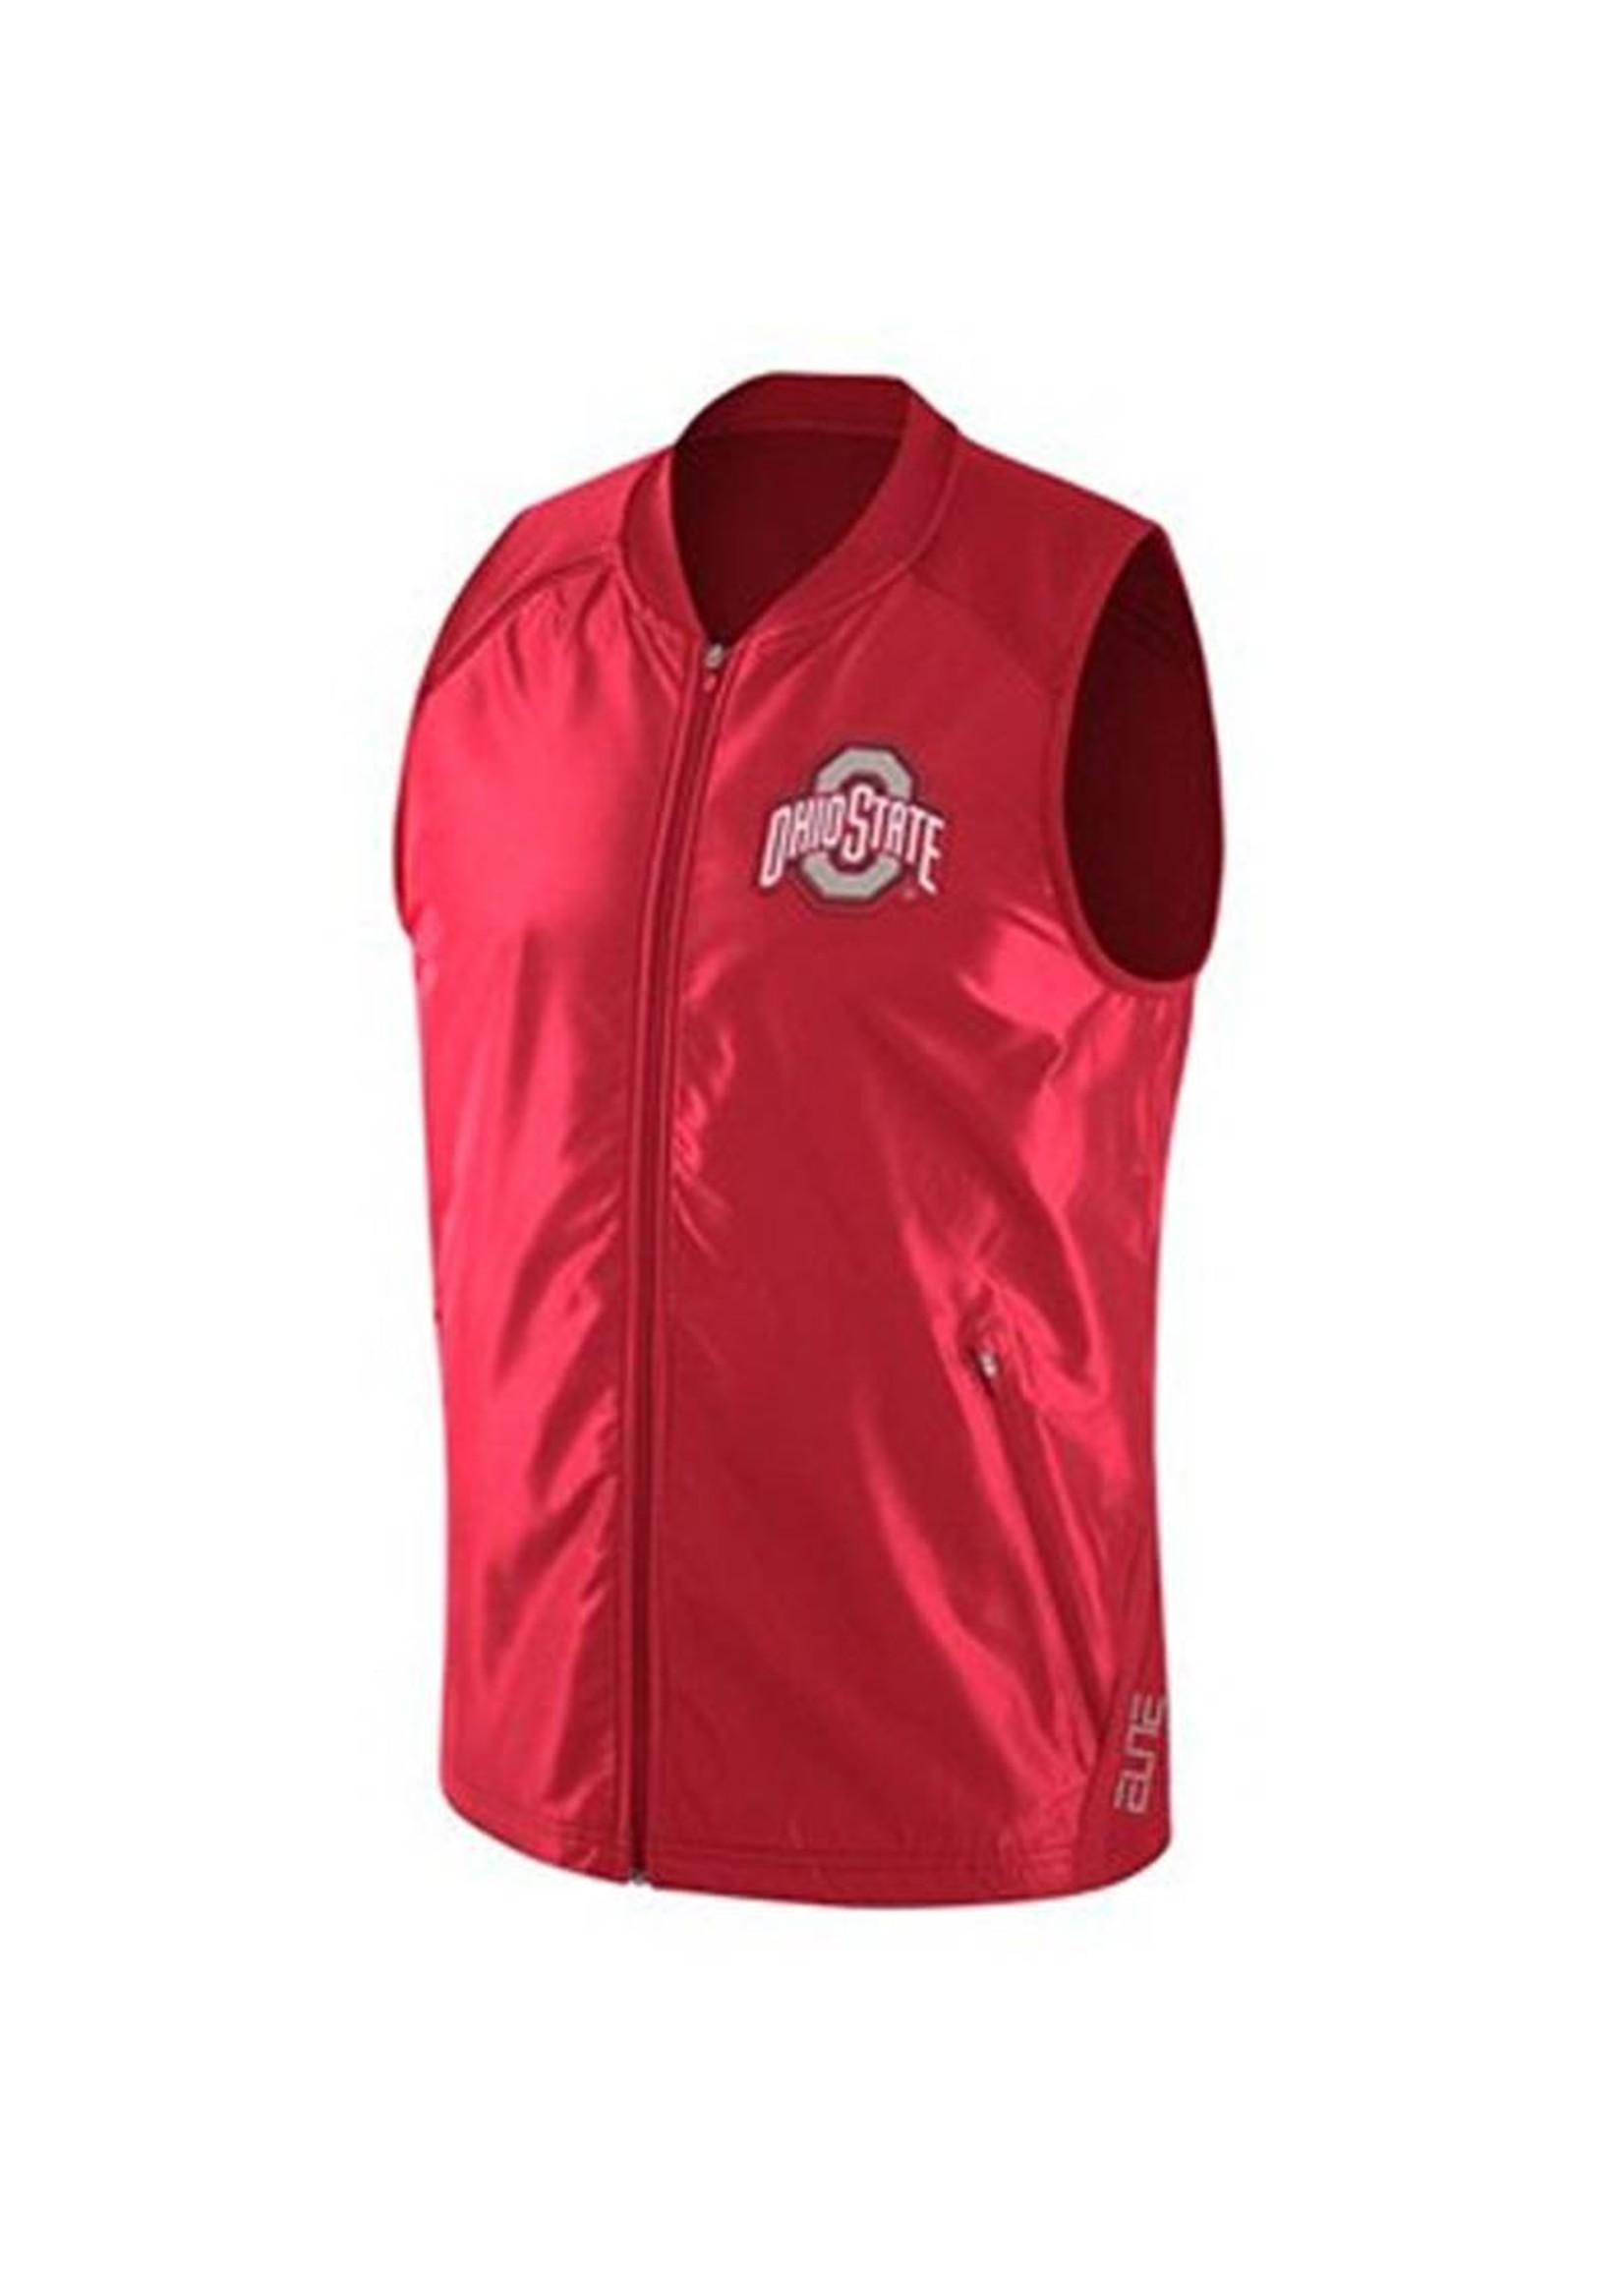 Nike Ohio State University Hyperelite Game Vest 2.0